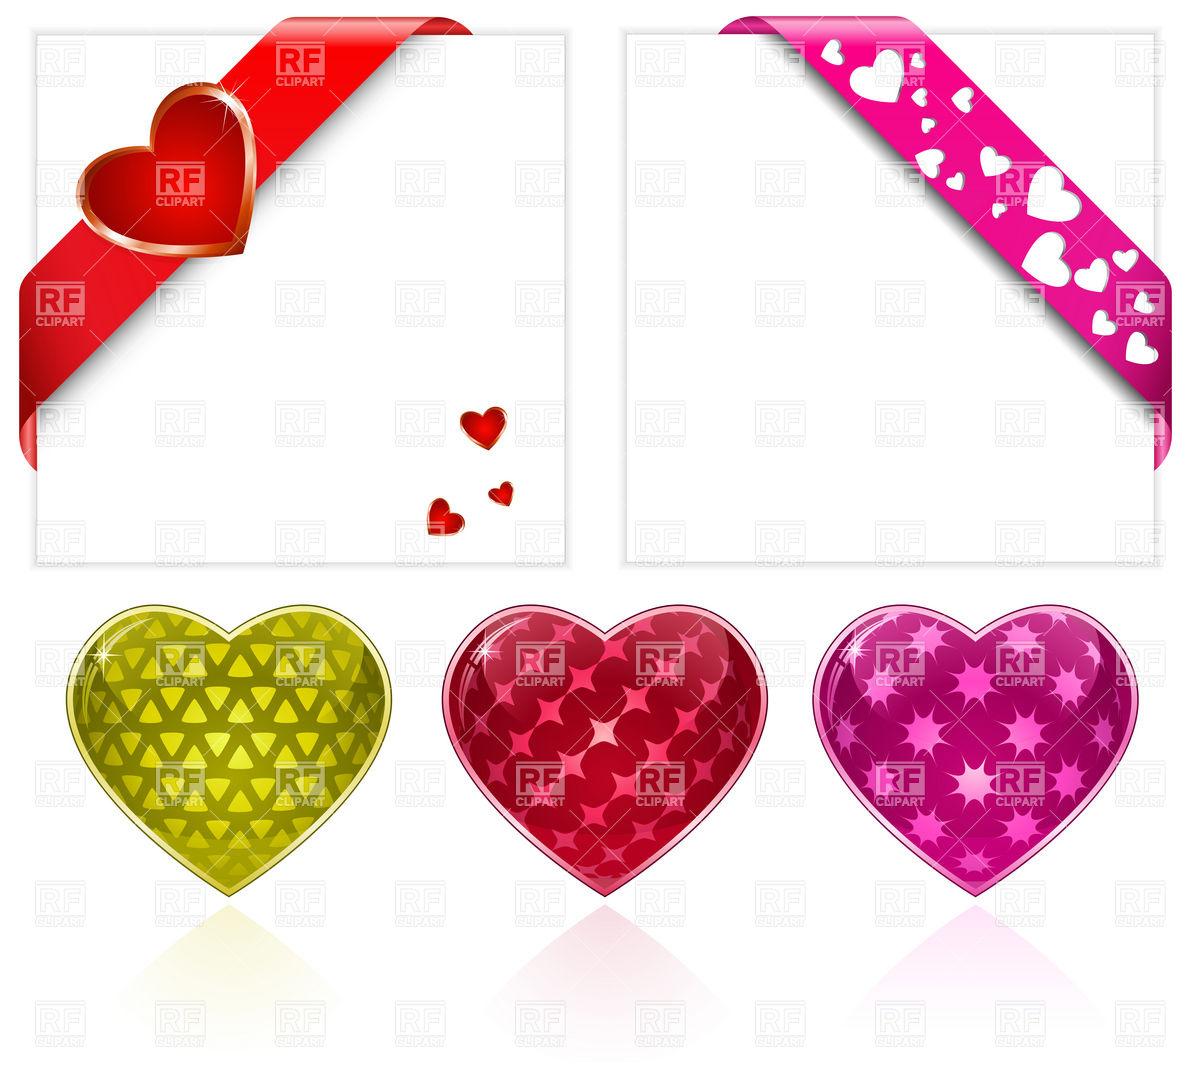 http://4.bp.blogspot.com/-IjwfoBEdFuQ/UPhHzehHMyI/AAAAAAAACl8/YeTN1W9NFhY/s1600/valentines+day+hearts+HD+wallpapers+pictures+(4).jpg